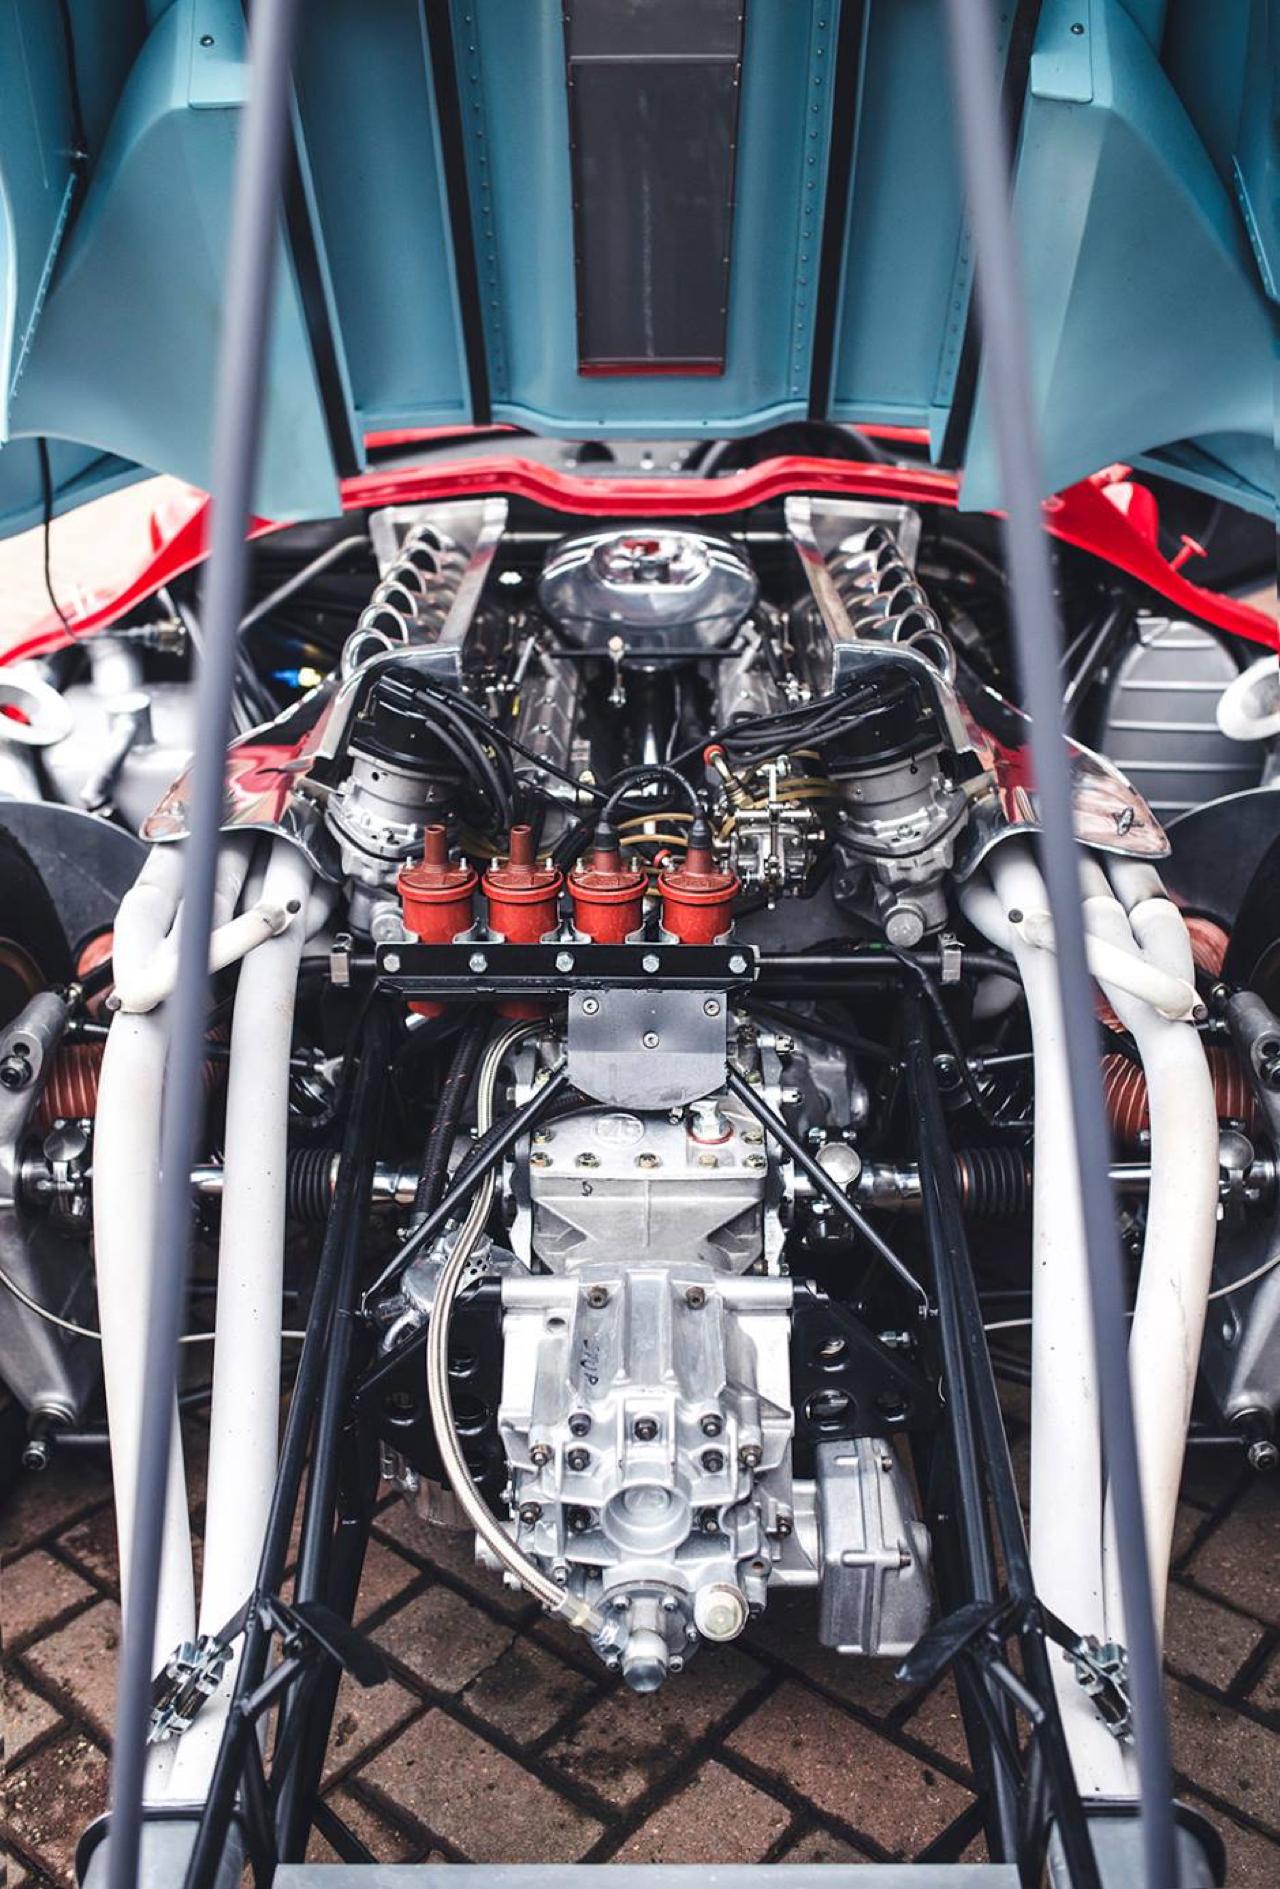 Ferrari 330 P4 - Un top model dans la course ! 6